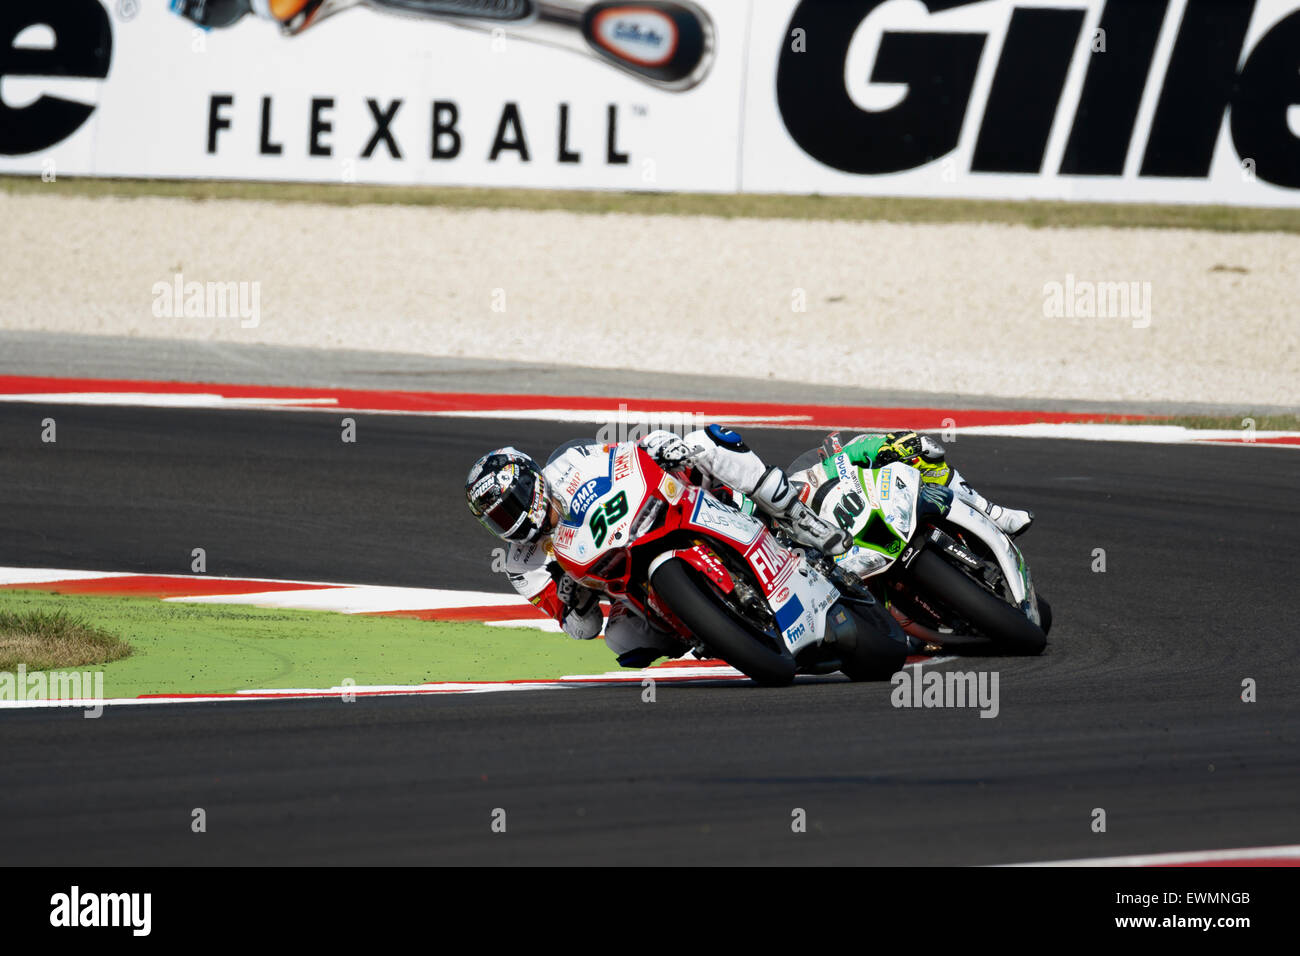 Misano Adriatico, Italy - June 21, 2015: Ducati Panigale R of Althea Racing Team, driven by CANEPA Niccolò Stock Photo